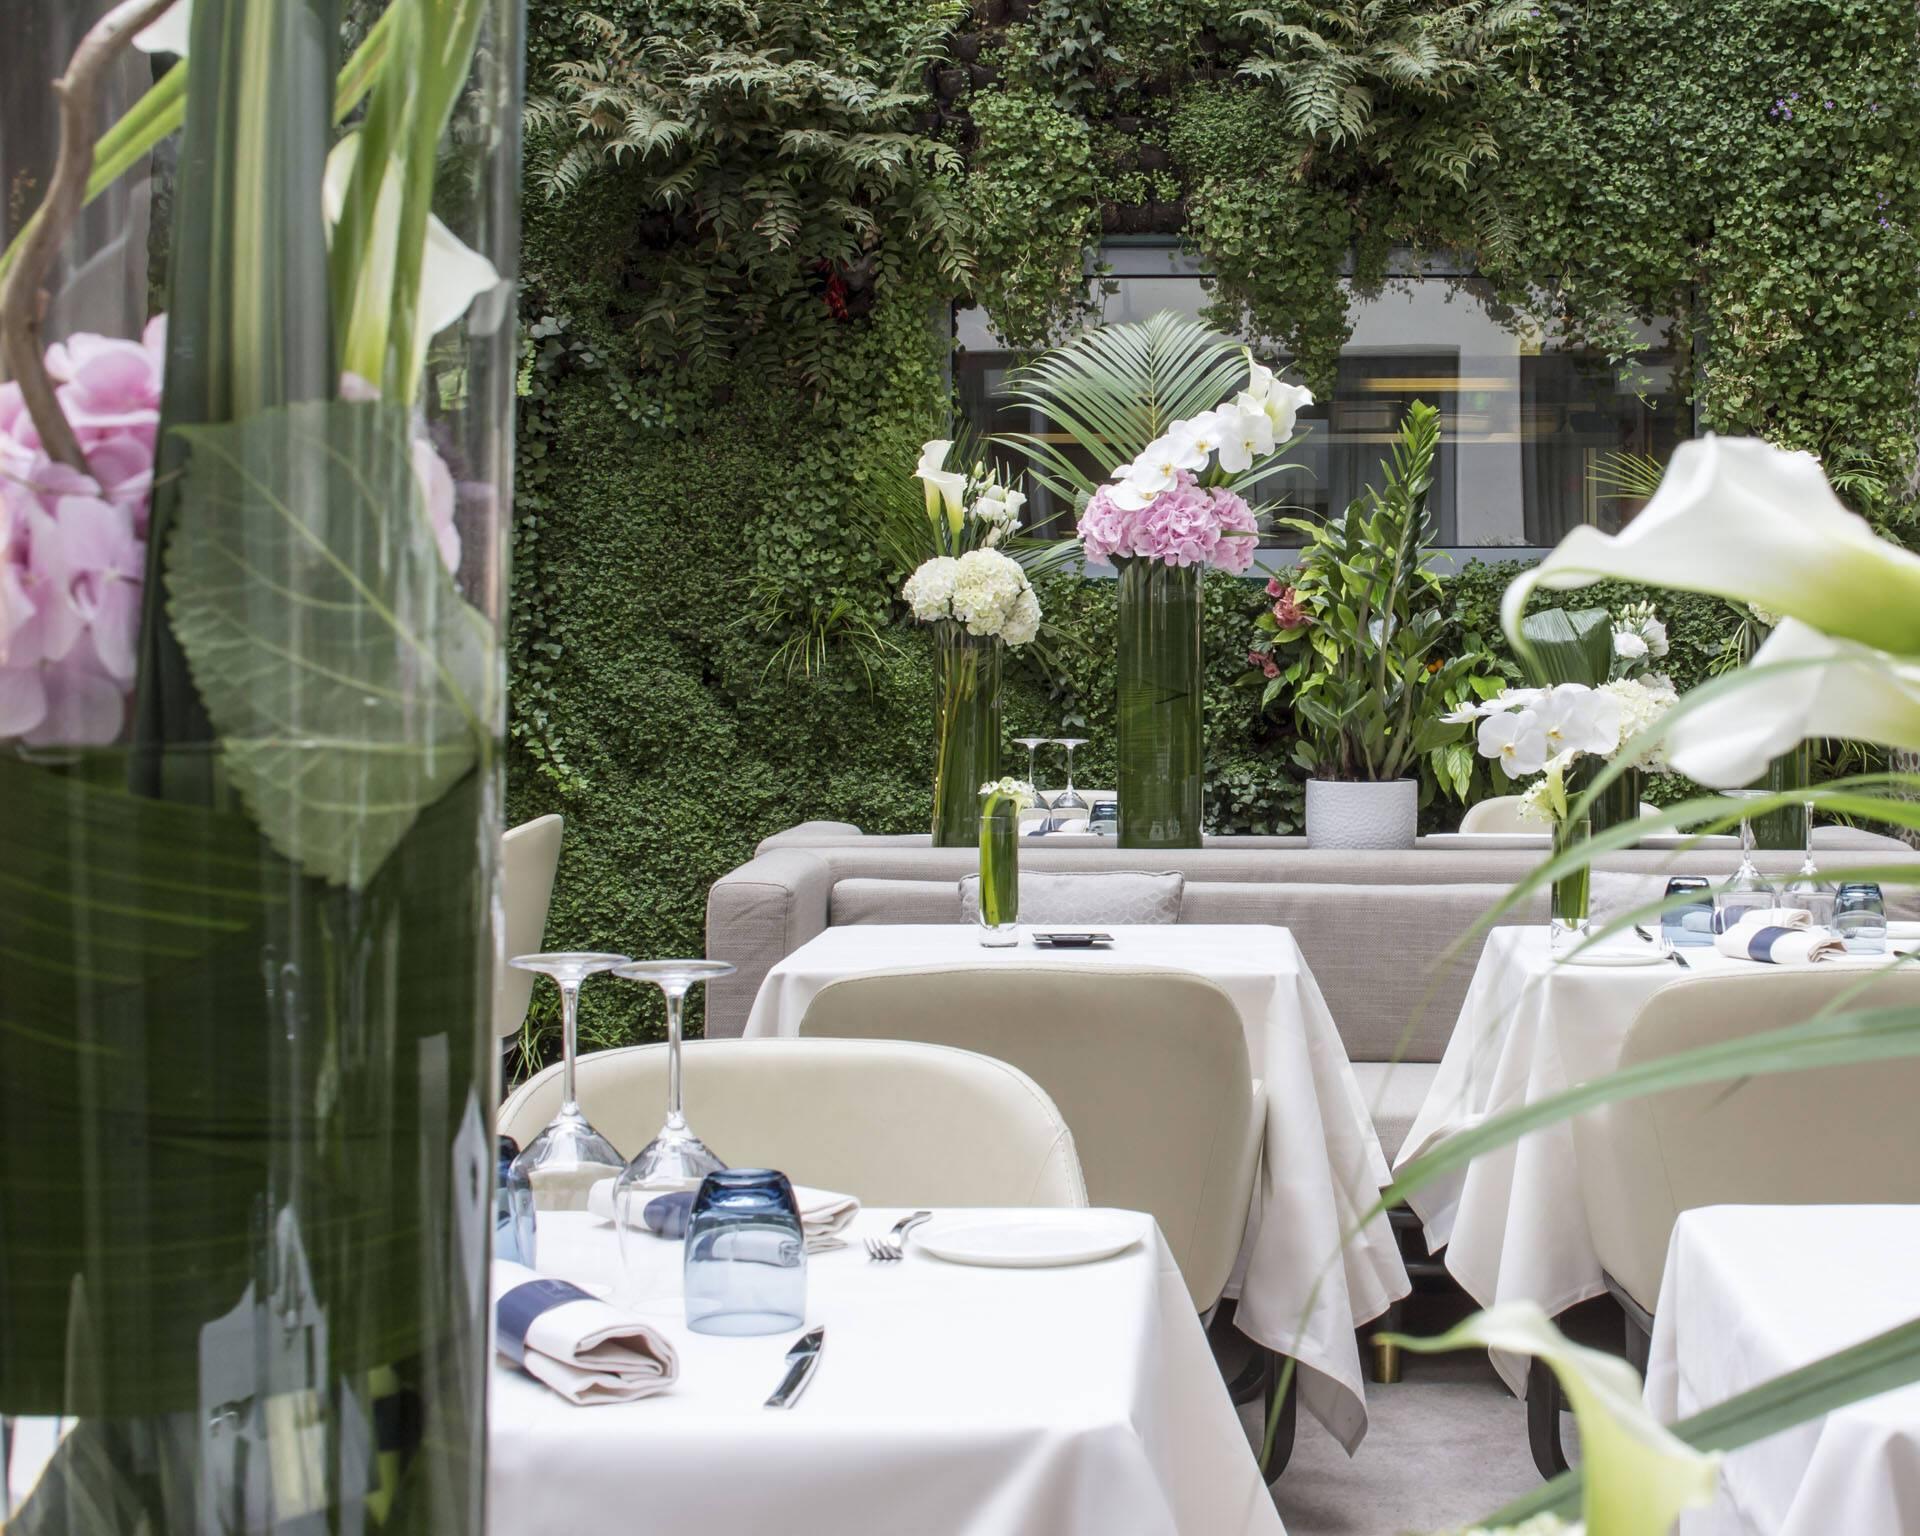 Hotel Sers Paris Restaurant Verriere